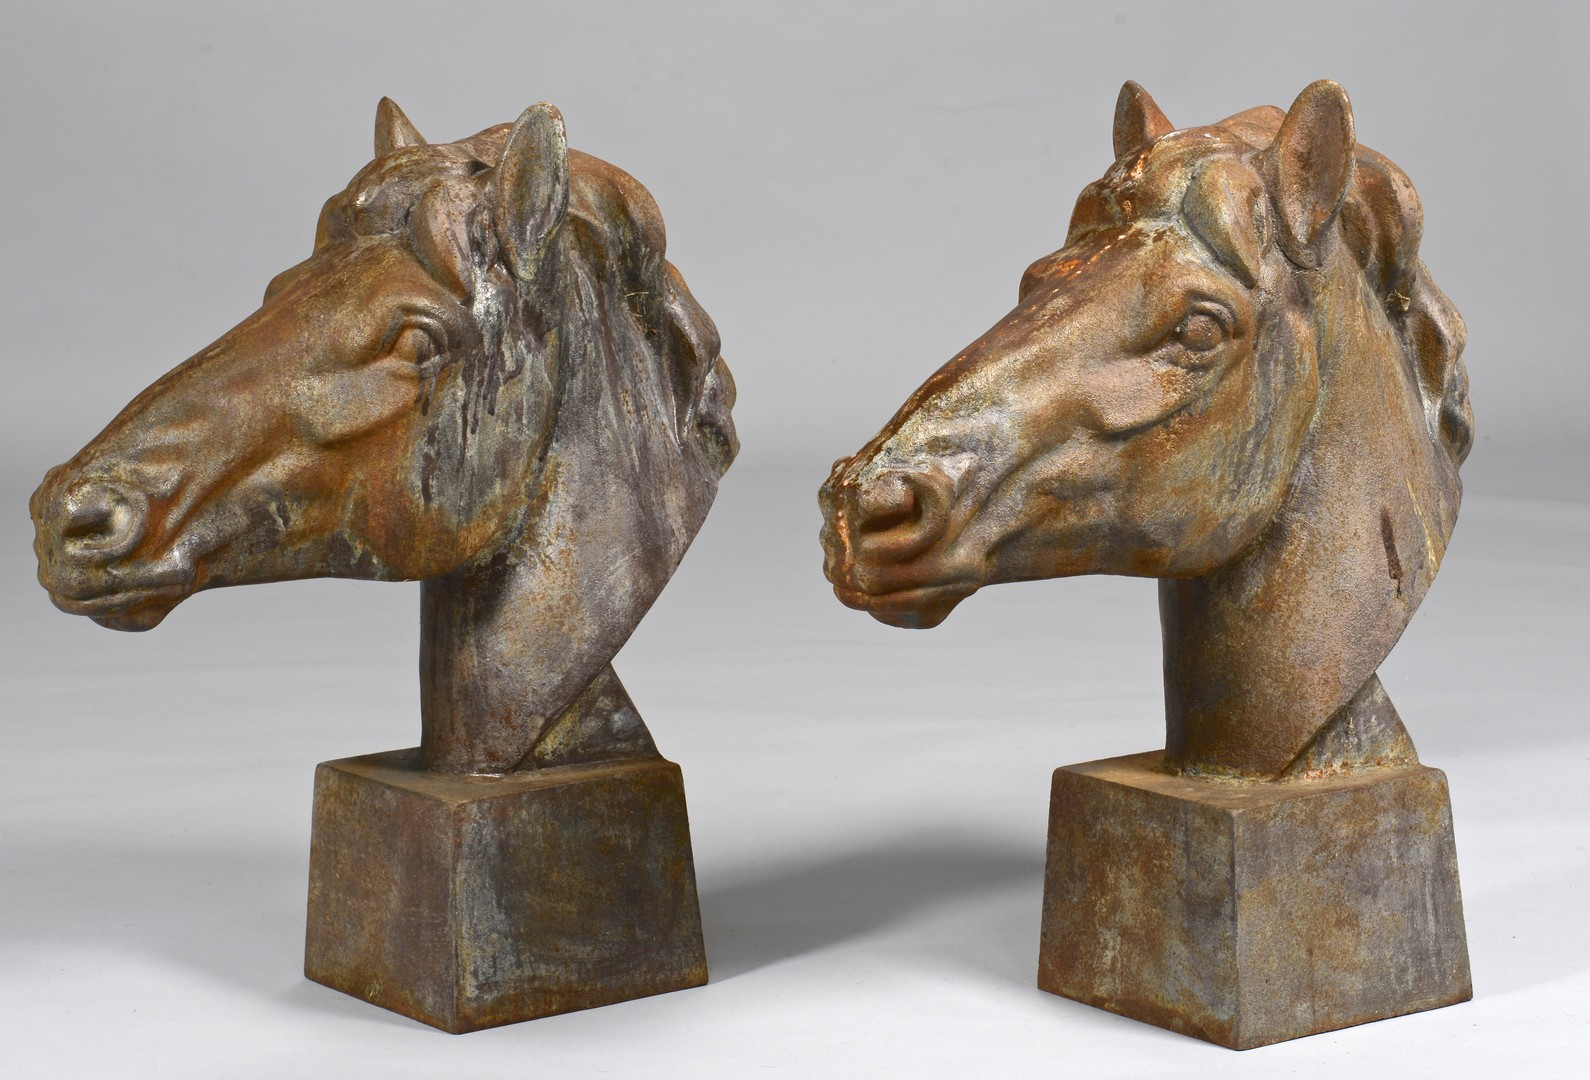 Lot 783 Pair Cast Iron Horse Heads